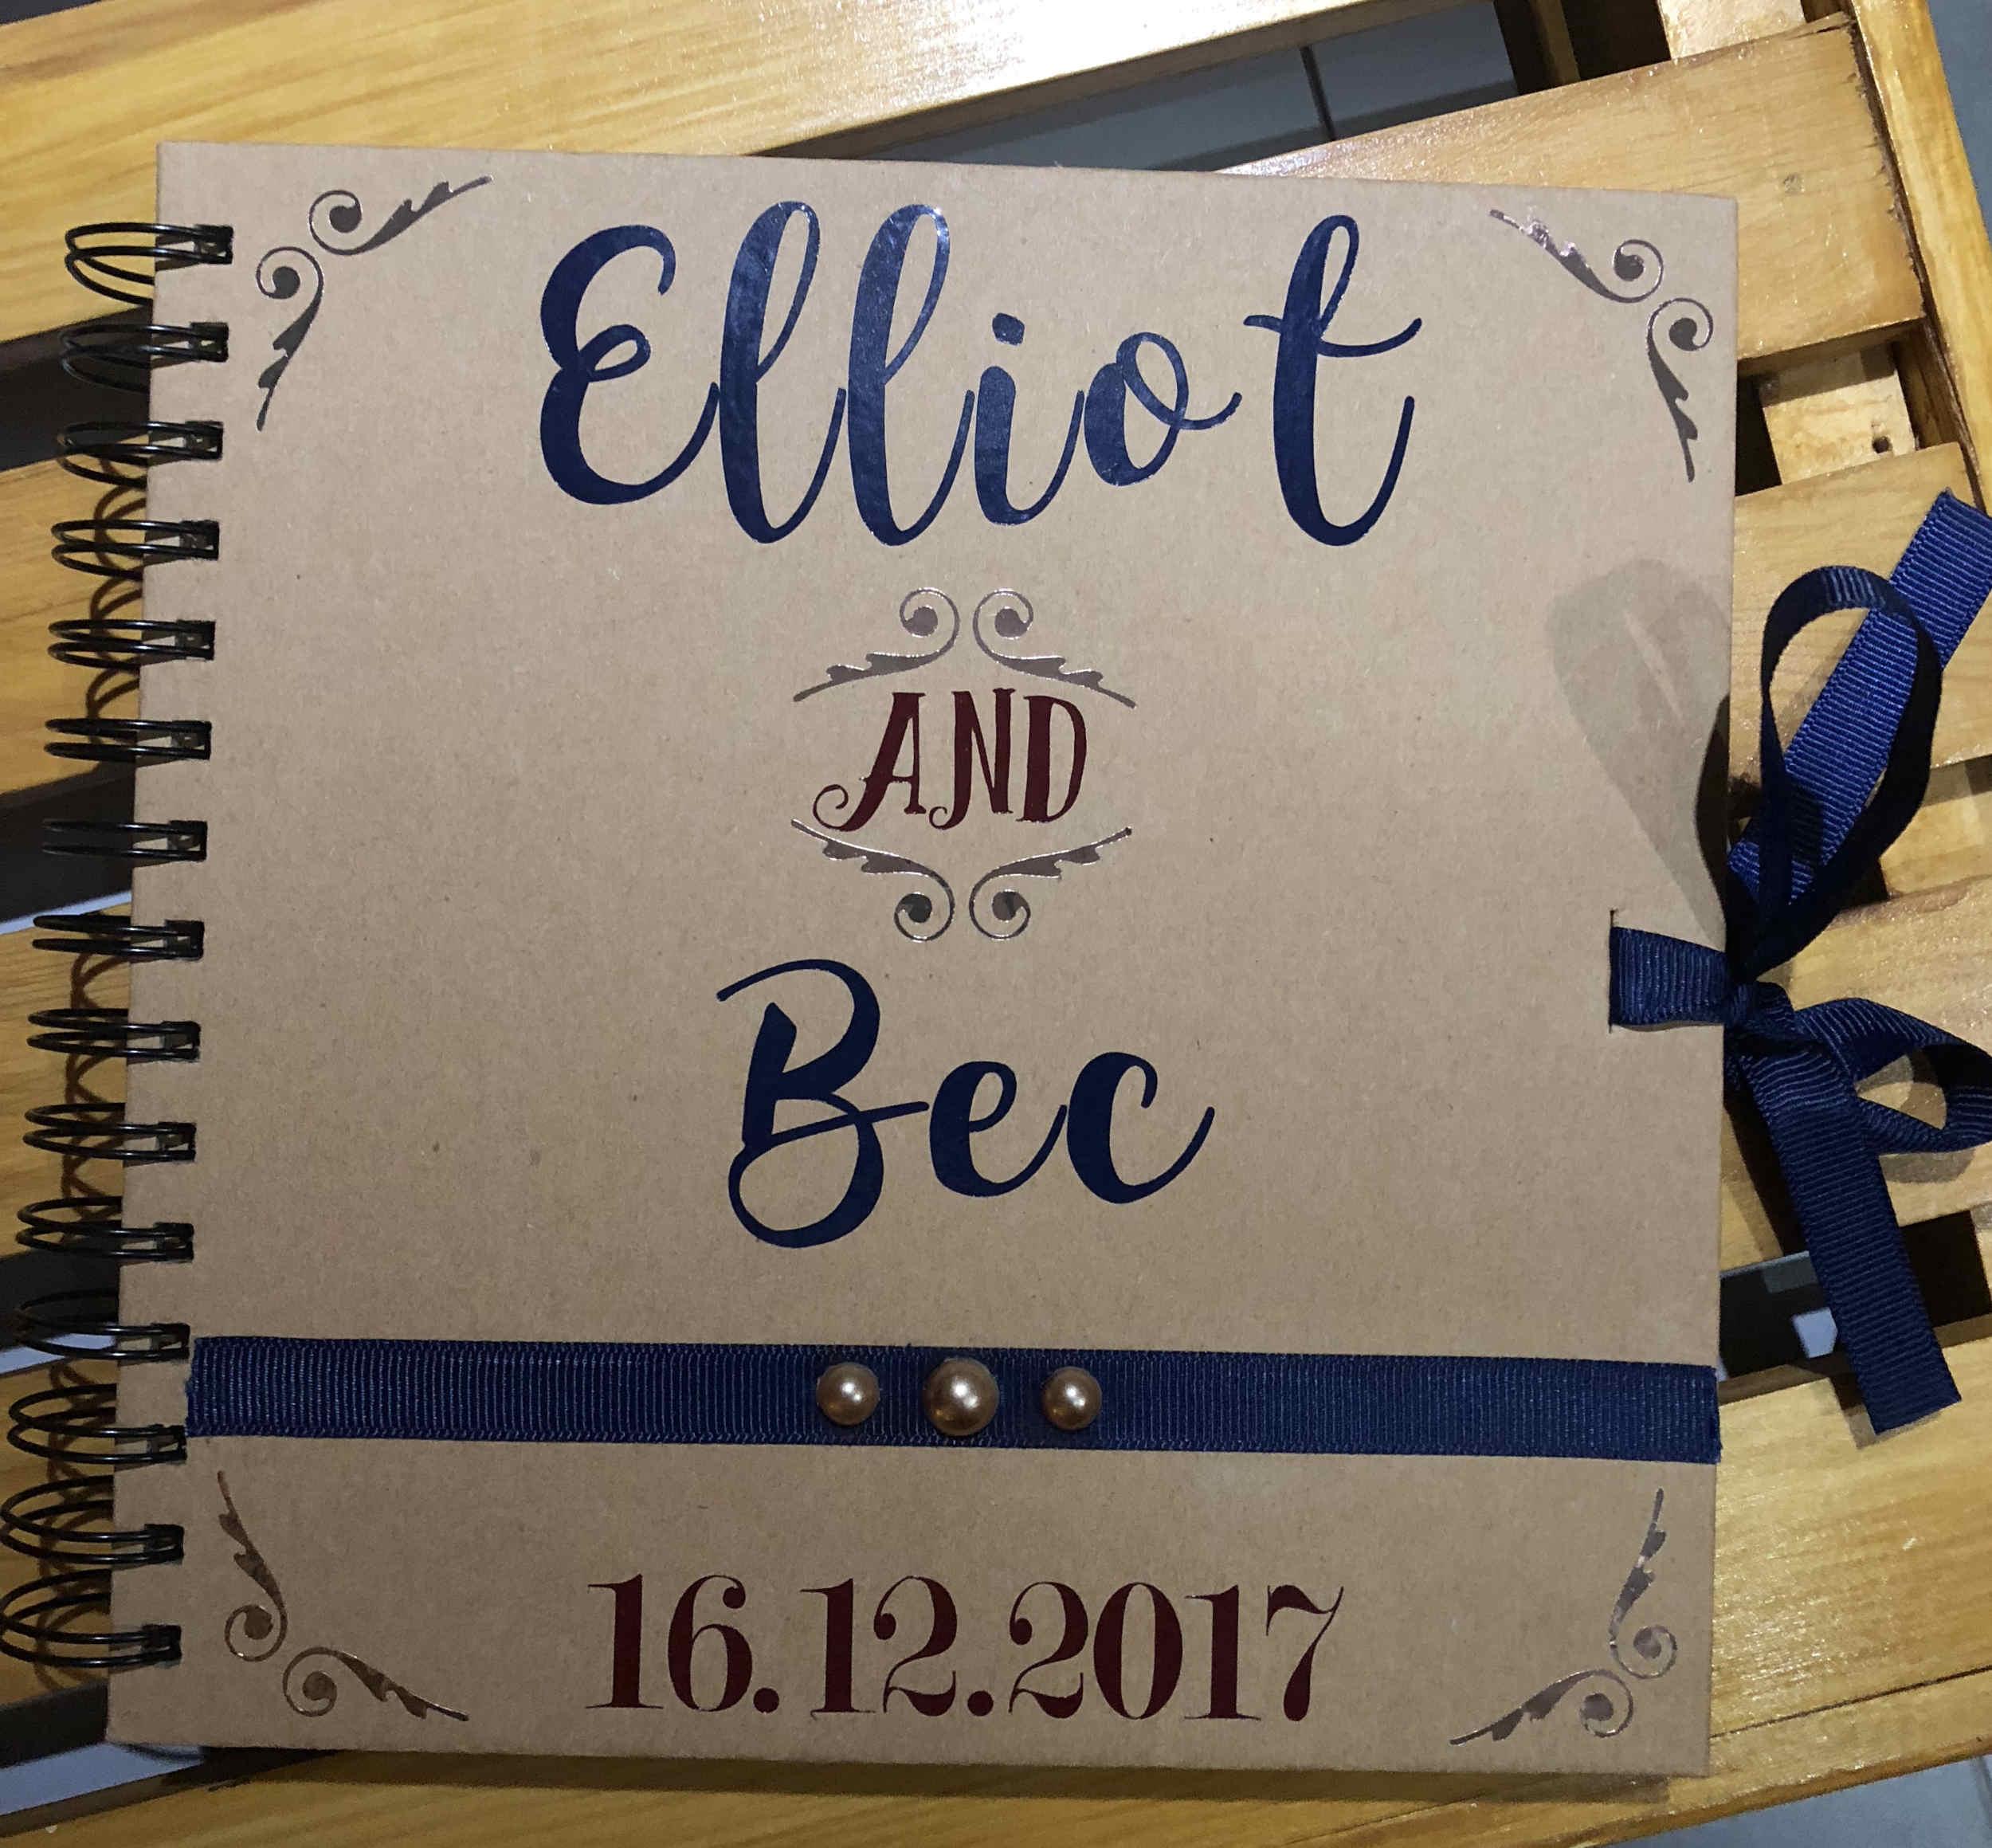 SnapStation blog -Elliot and Bec8.jpg